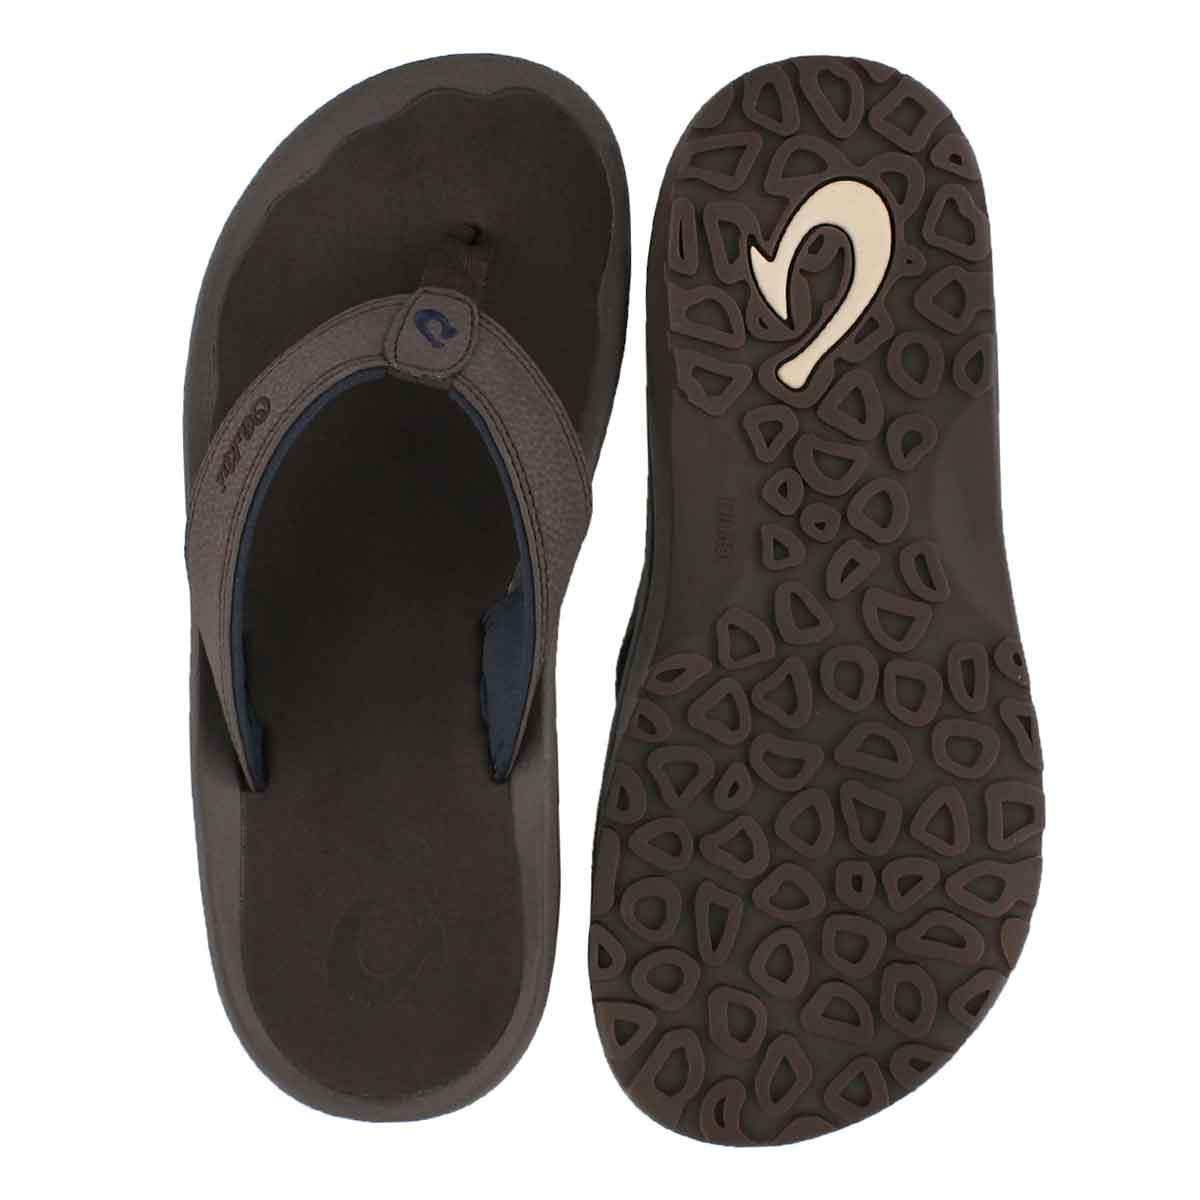 Mns Ohana dark wood thong sandal